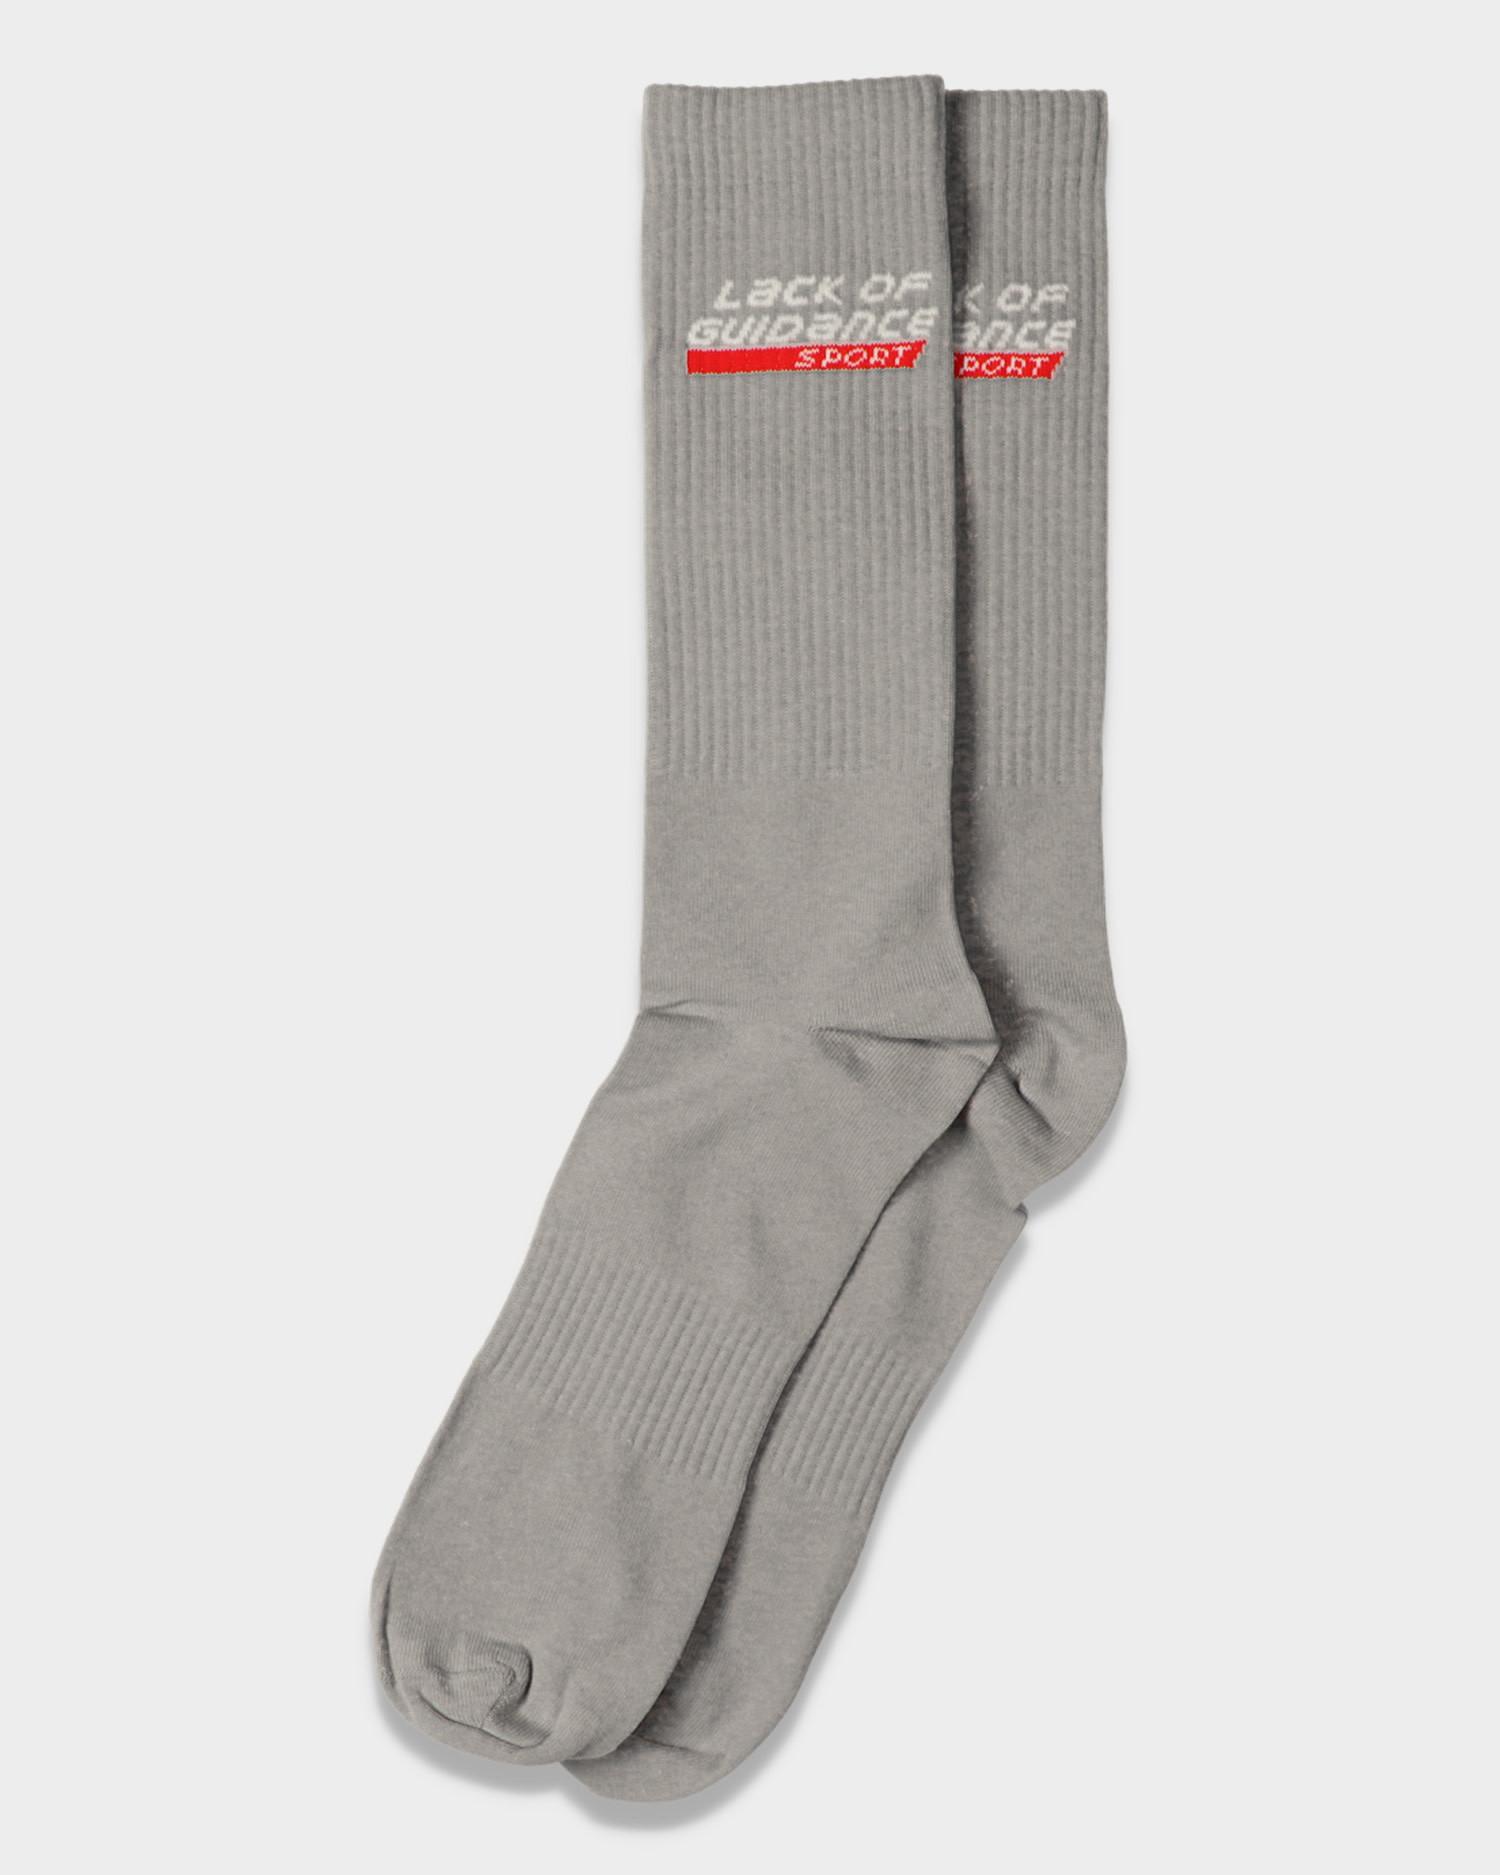 Lack Of Guidance Sport Socks Grey